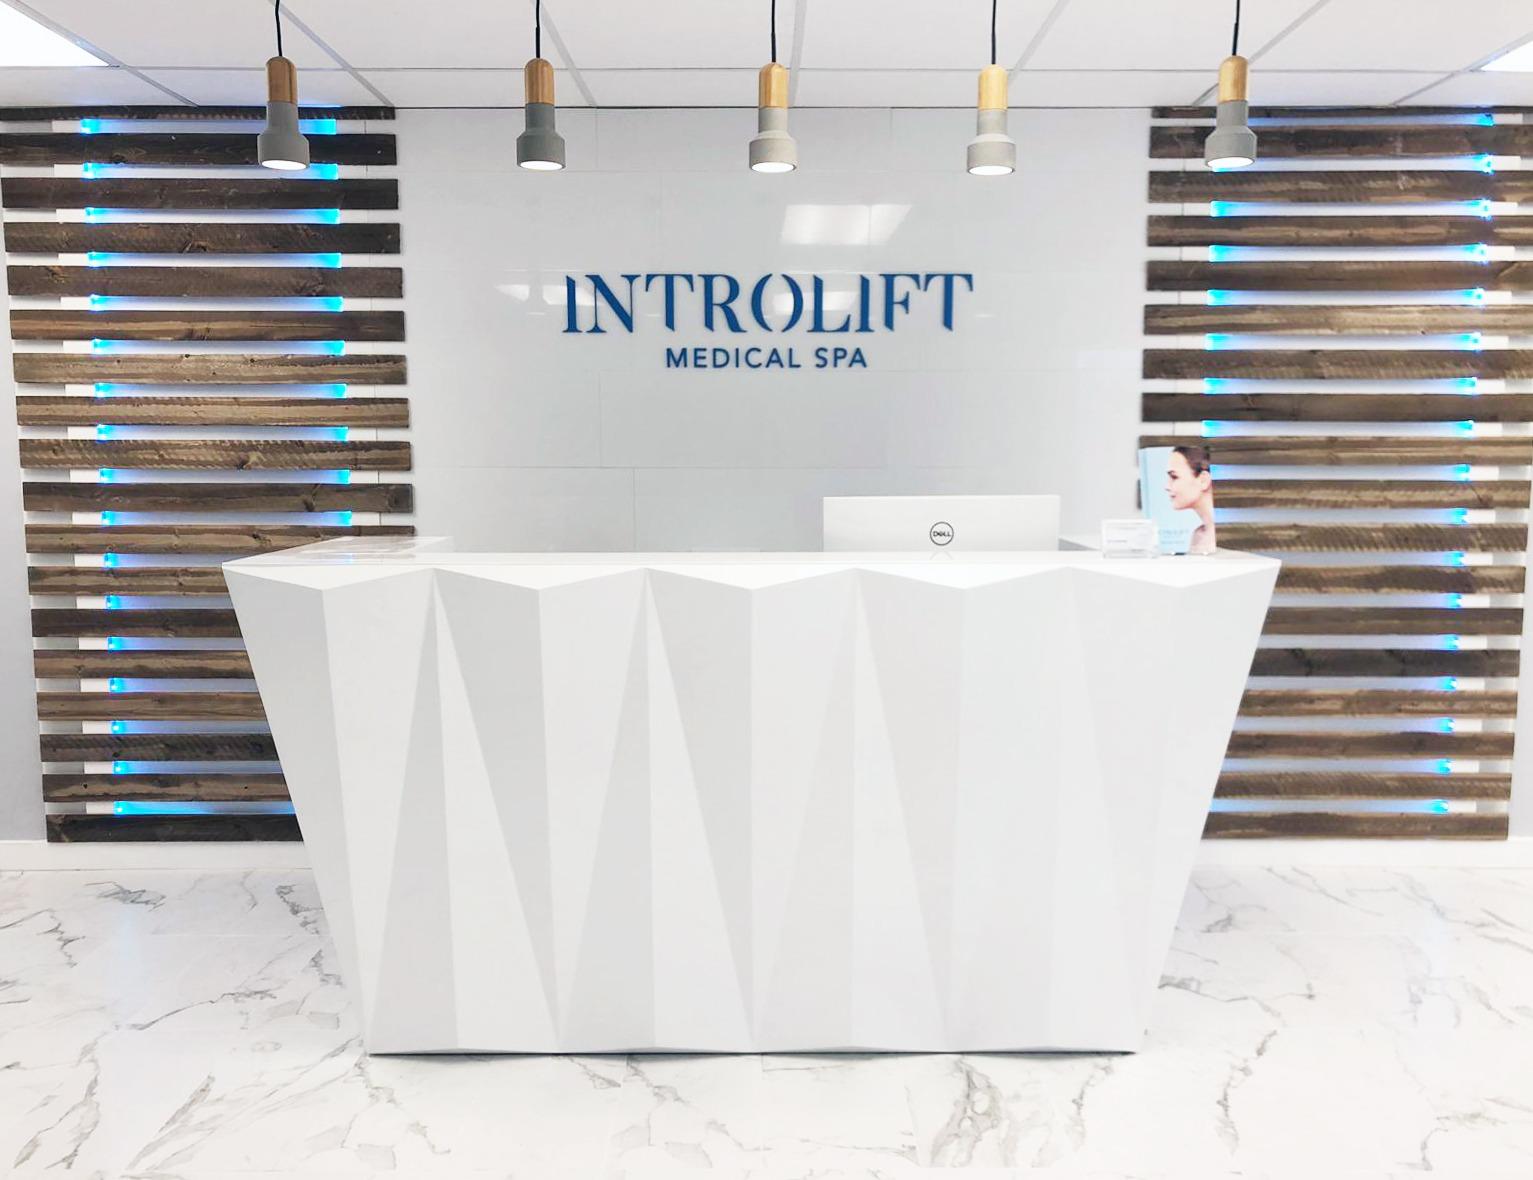 Introlift Medical Spa image 1